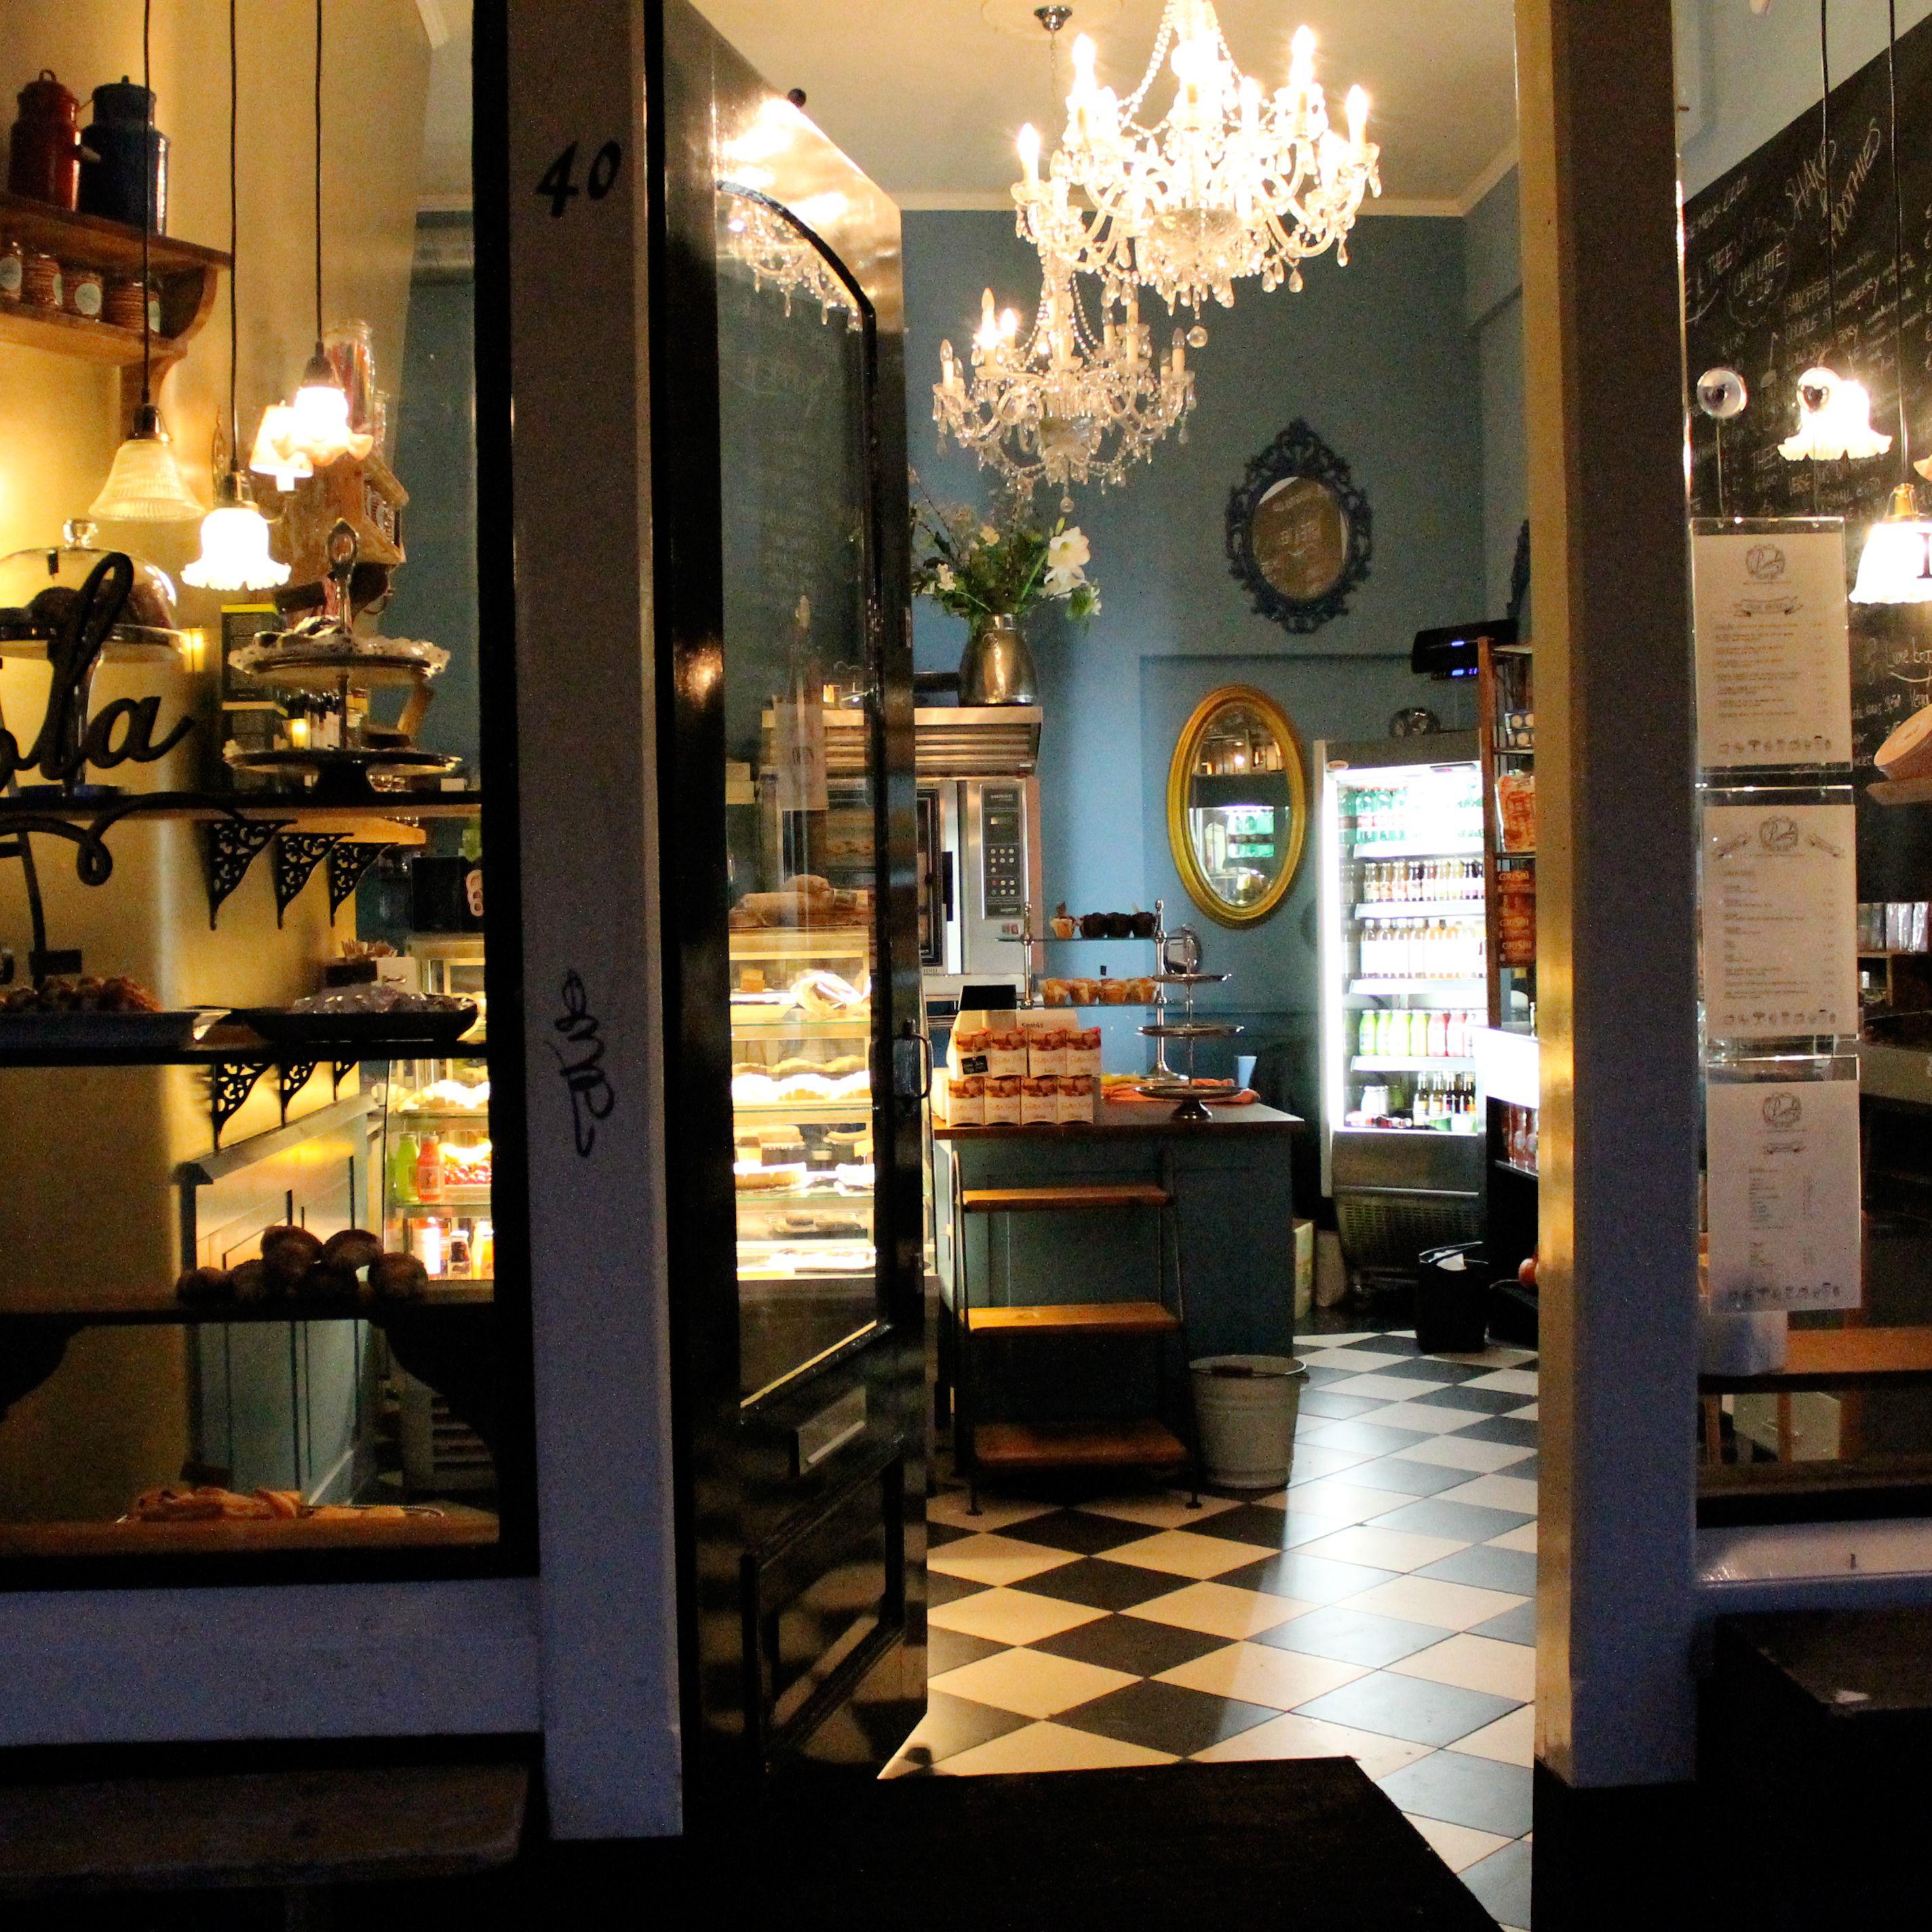 Shop Decoration: Interior Design For Bakery Shop In Amsterdam.